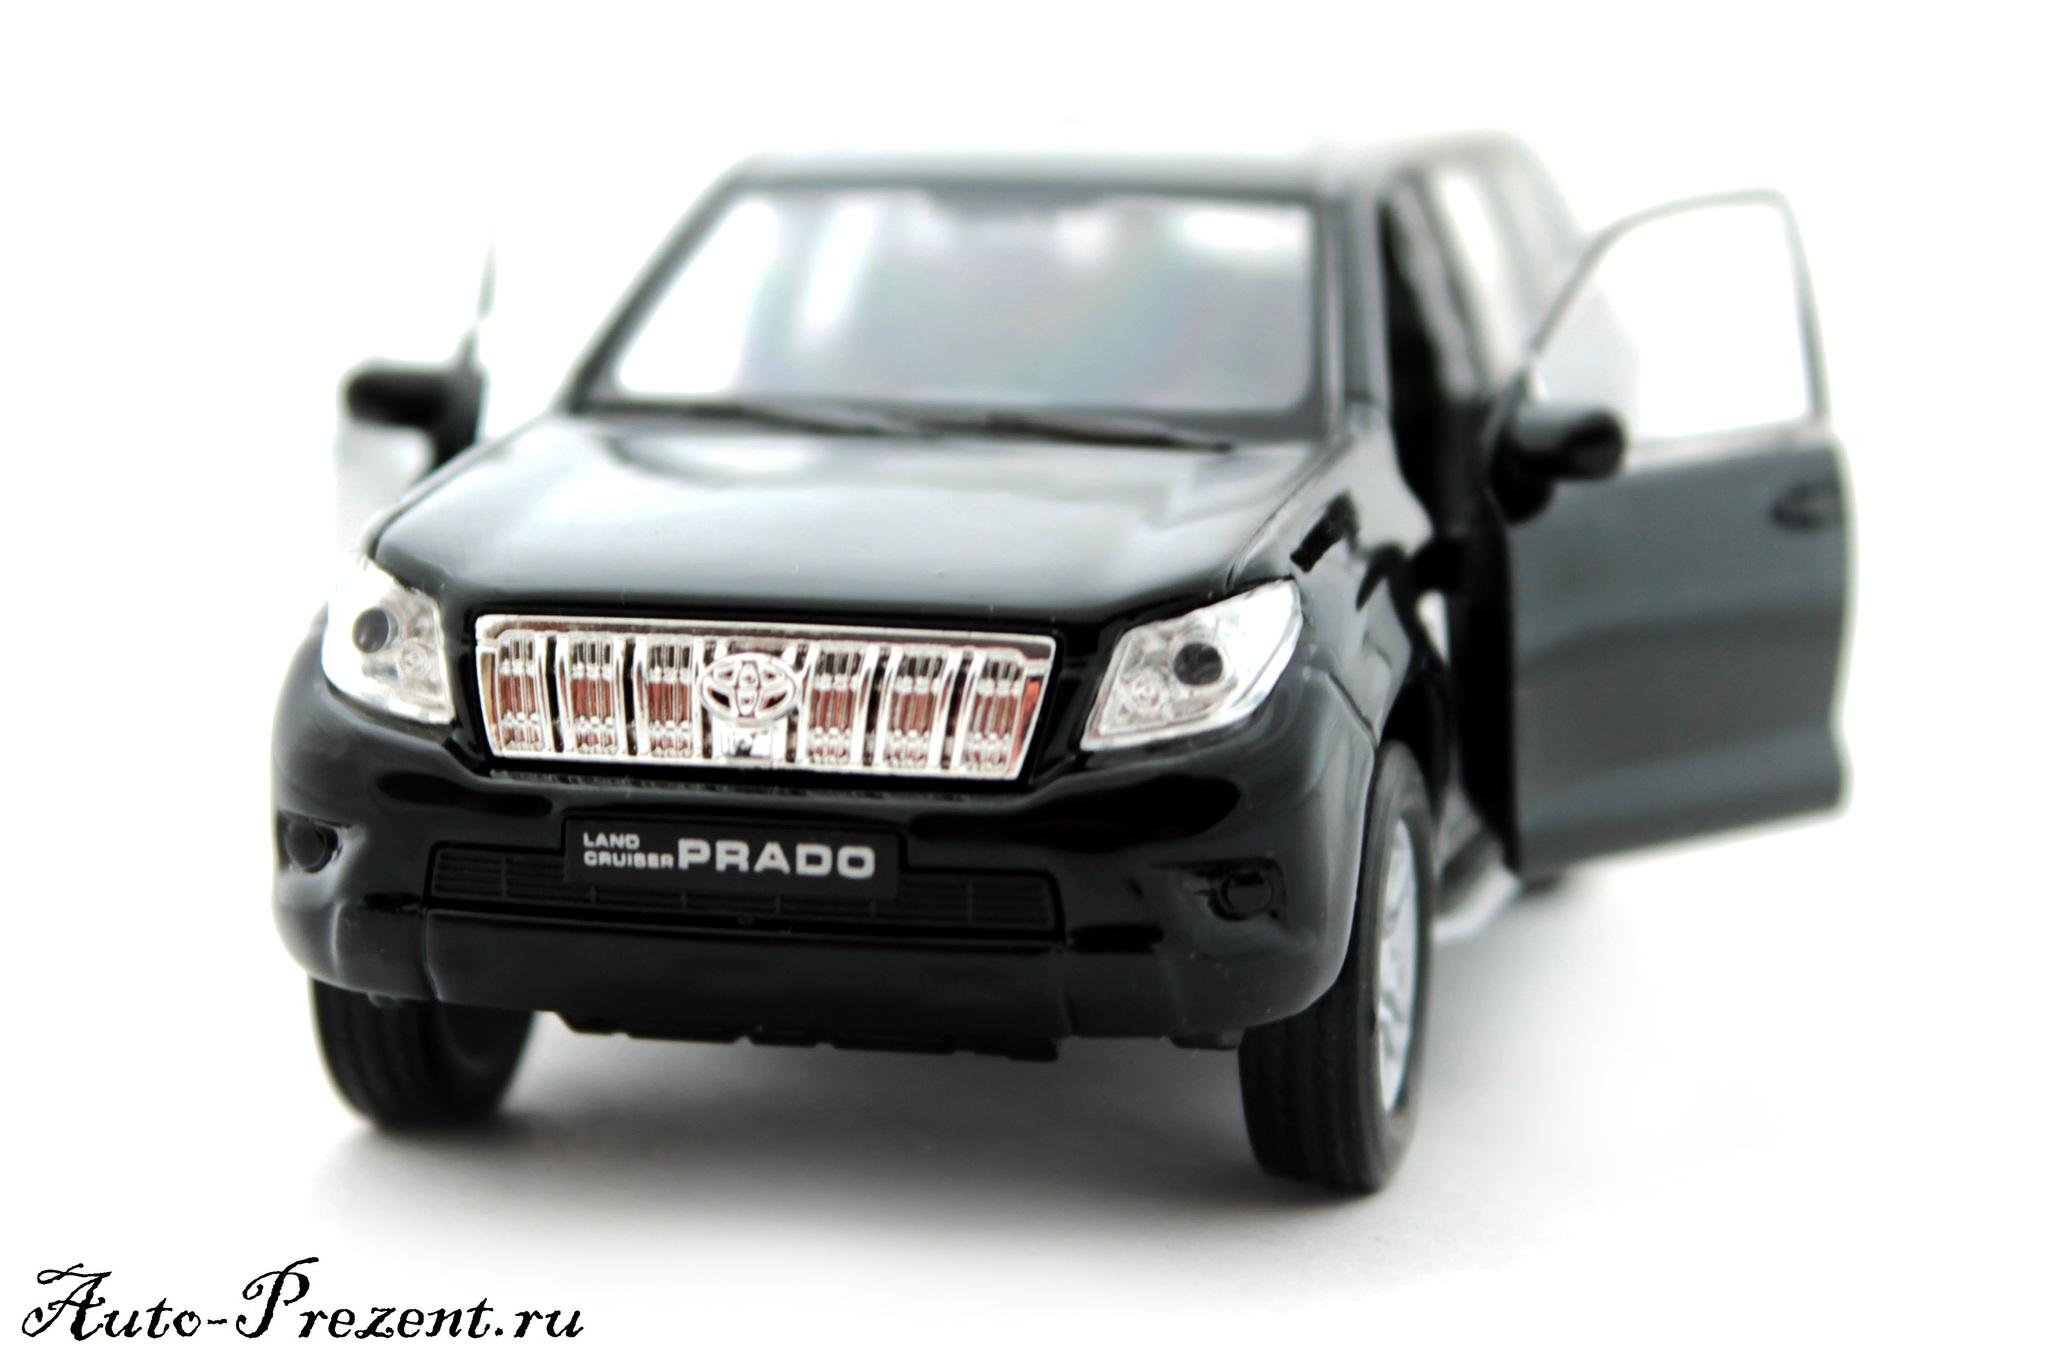 Машинка-игрушка Toyota Land Cruiser Prado